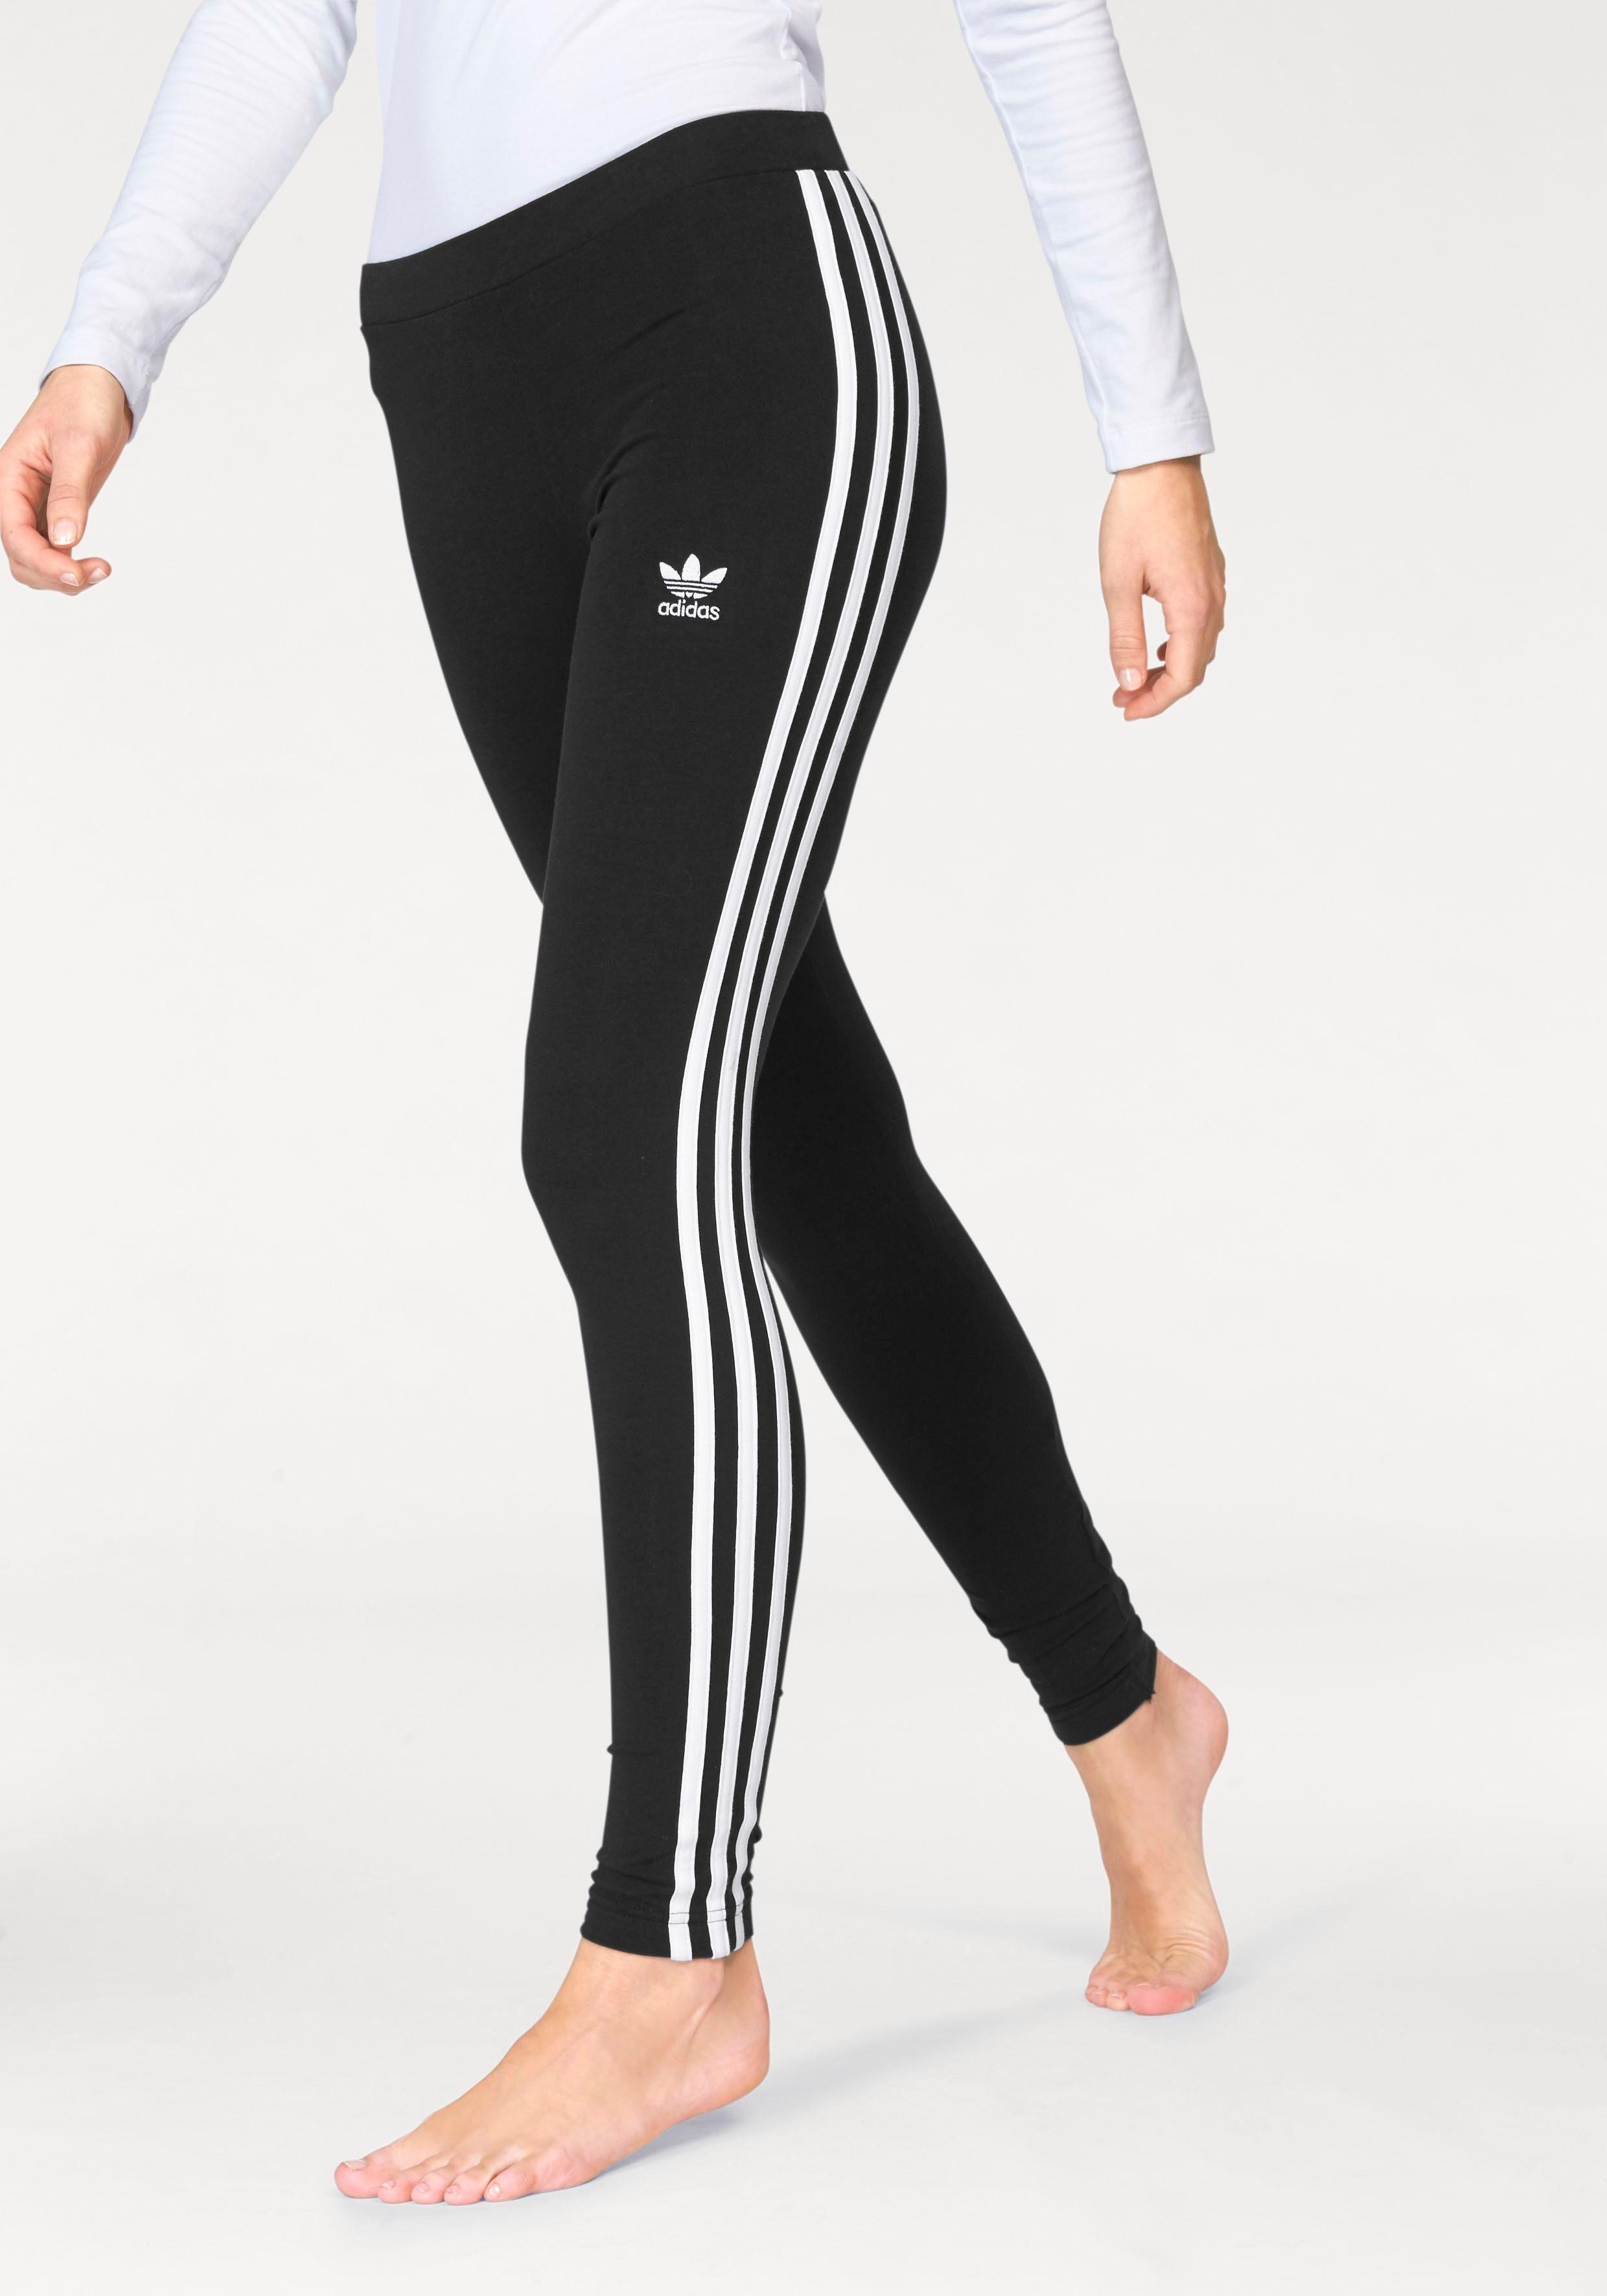 adidas originals damen leggings mit 3 streifen